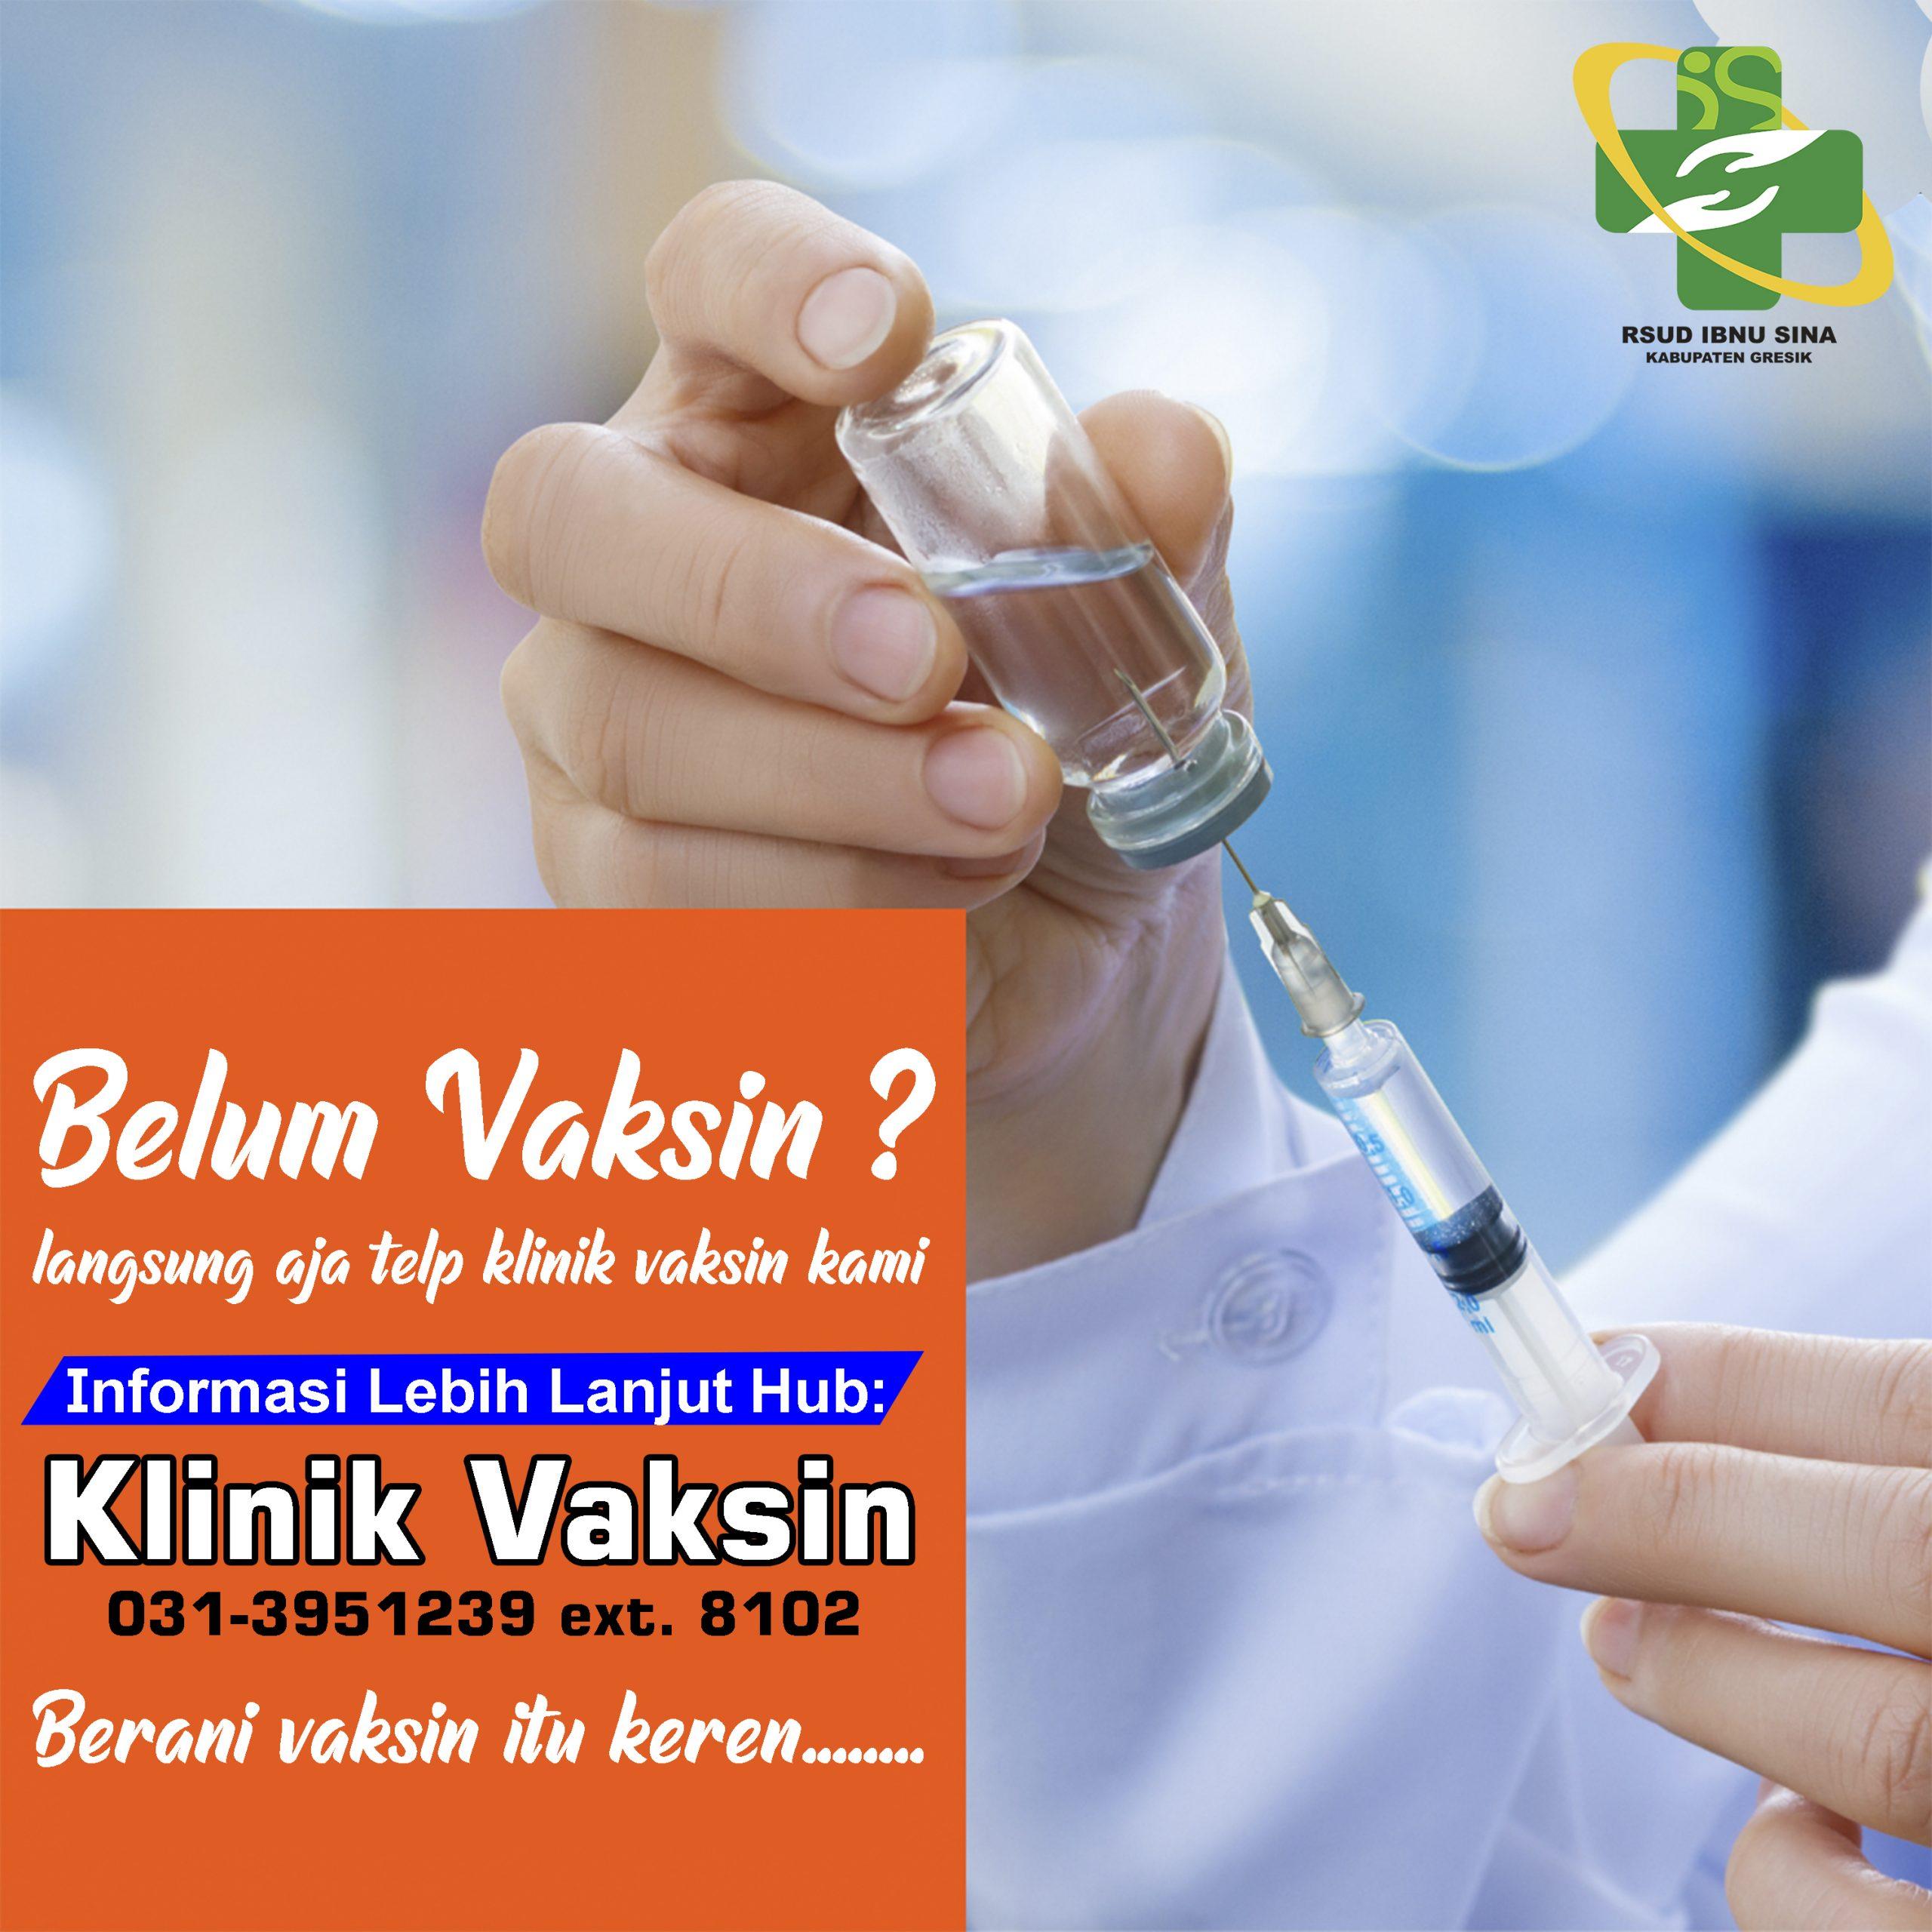 Klinik Vaksin RSUD Ibnu Sina Kab. Gresik